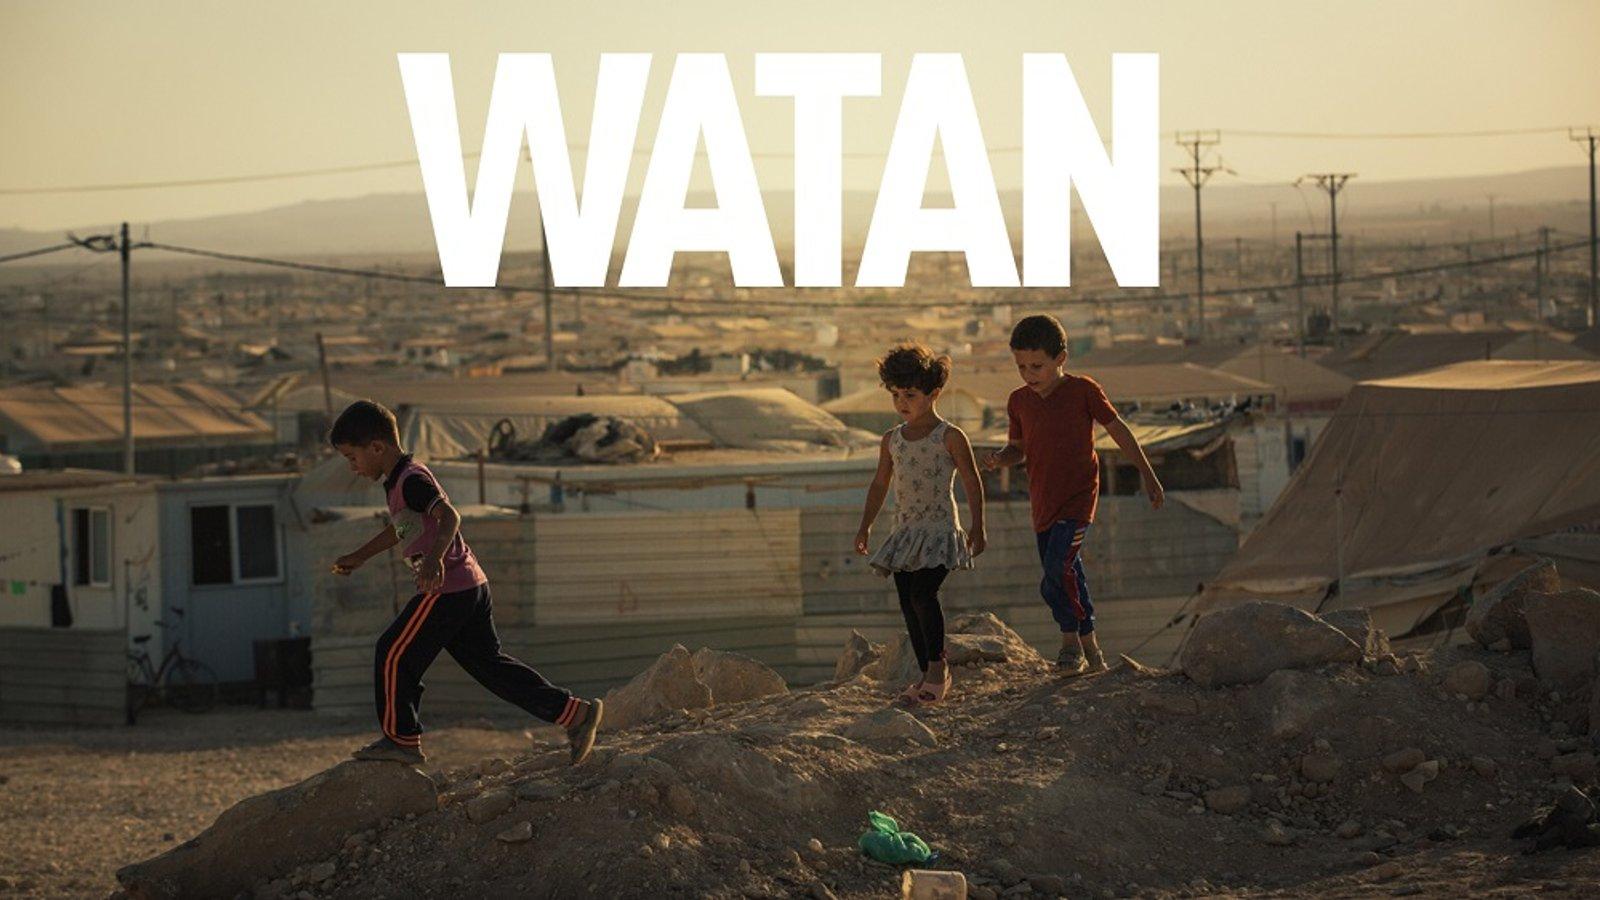 Watan - Portraits of Syrian Refugees in Jordan